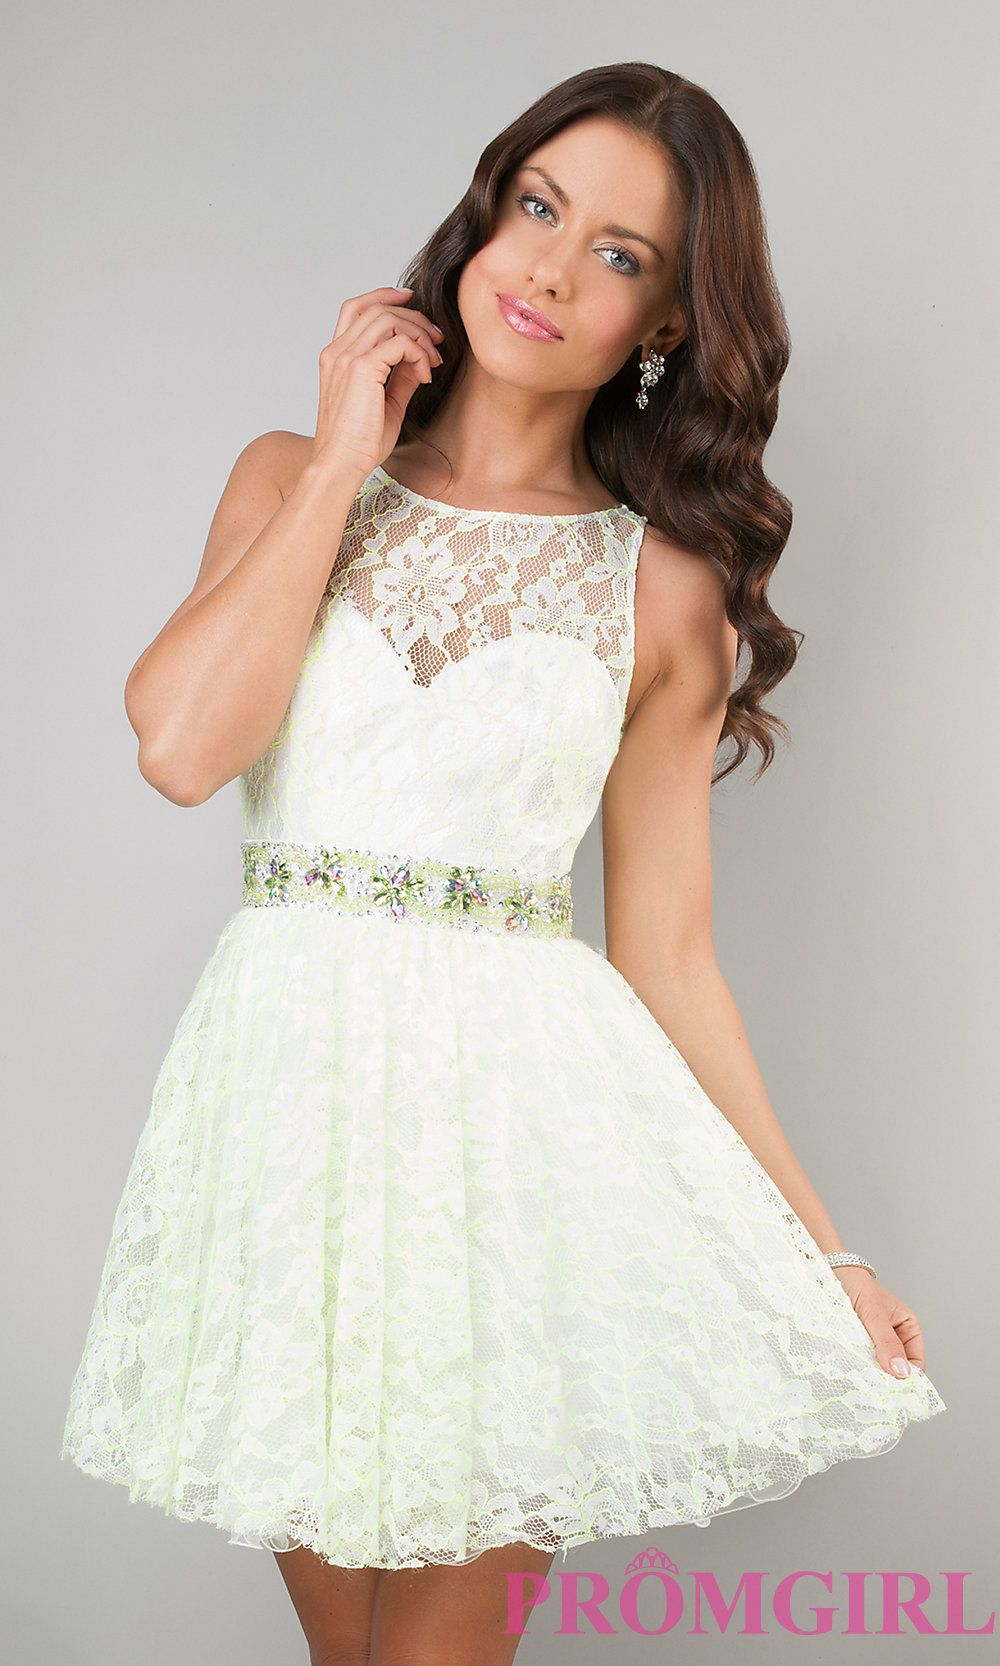 Imagen relacionada modelos de roupas pinterest fashion beauty